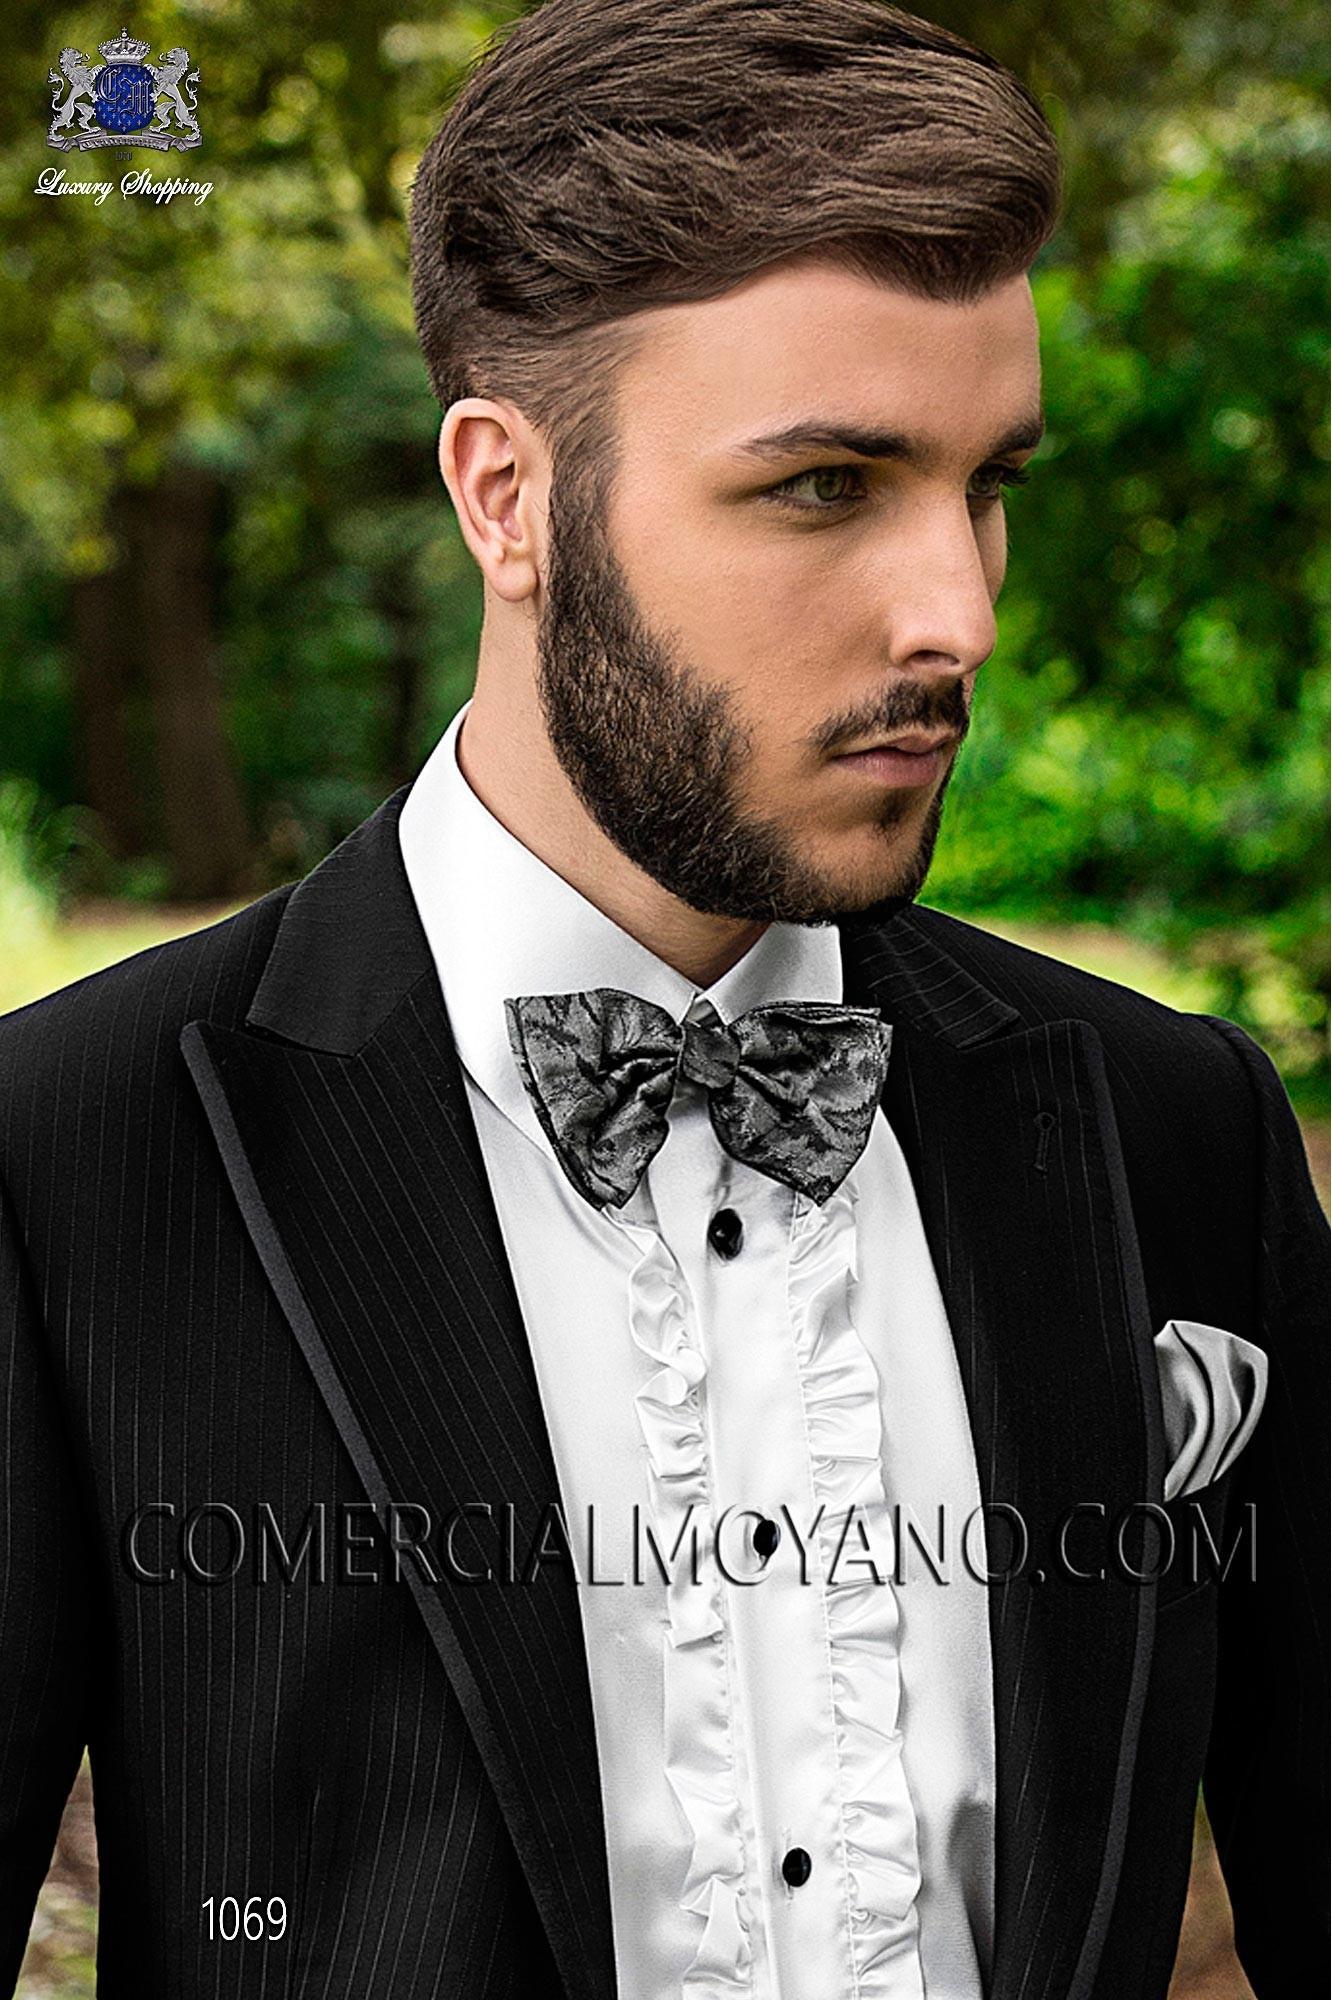 Italian fashion black men wedding suit, model: 1069 Ottavio Nuccio Gala Fashion Collection